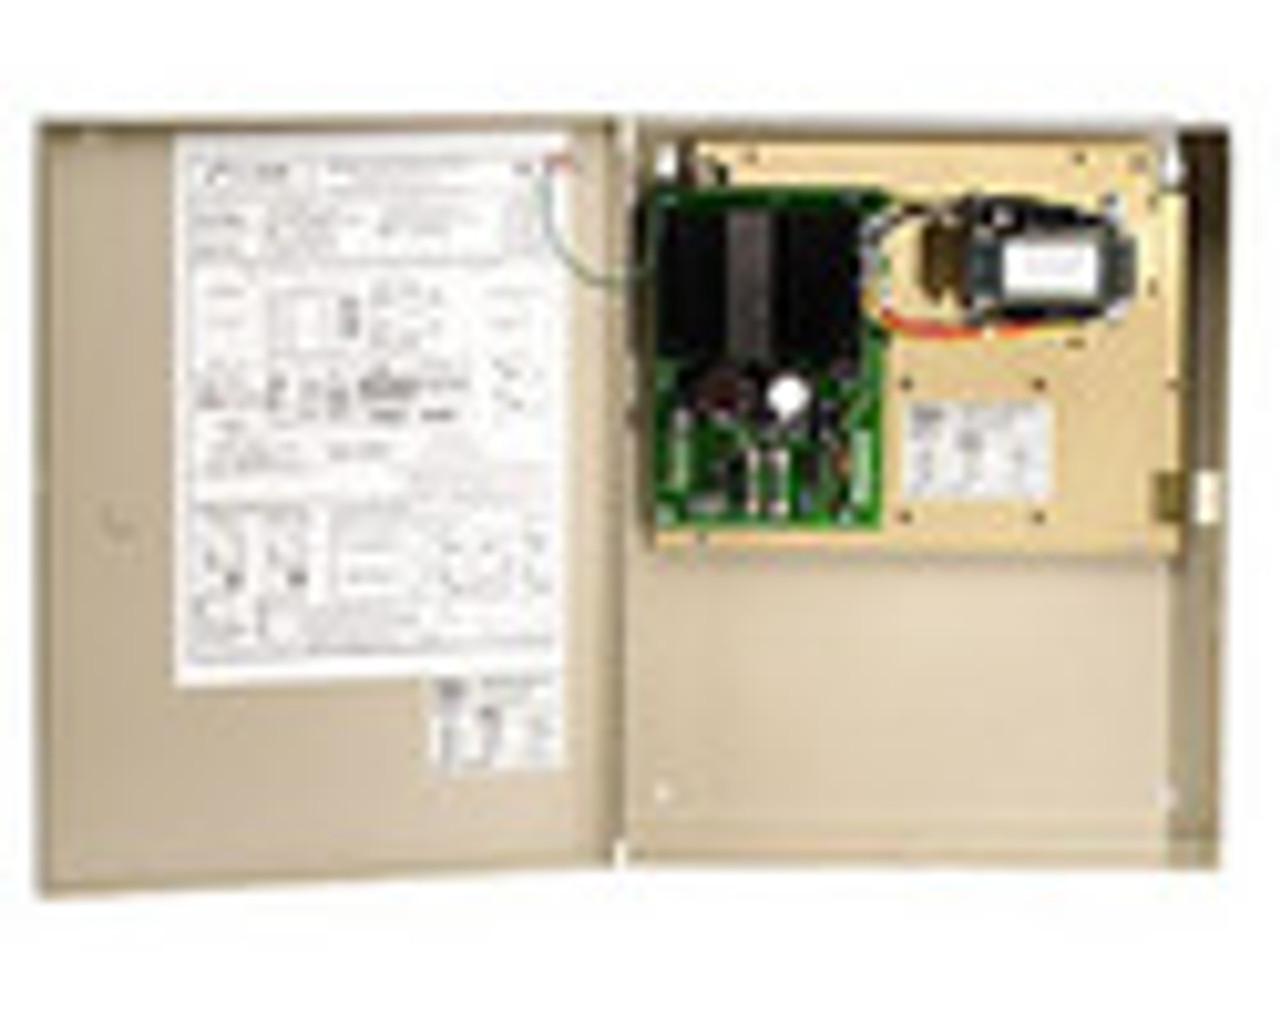 5500-KLC DynaLock Multi Zone Medium Duty Power Supply with Key Locked Cover